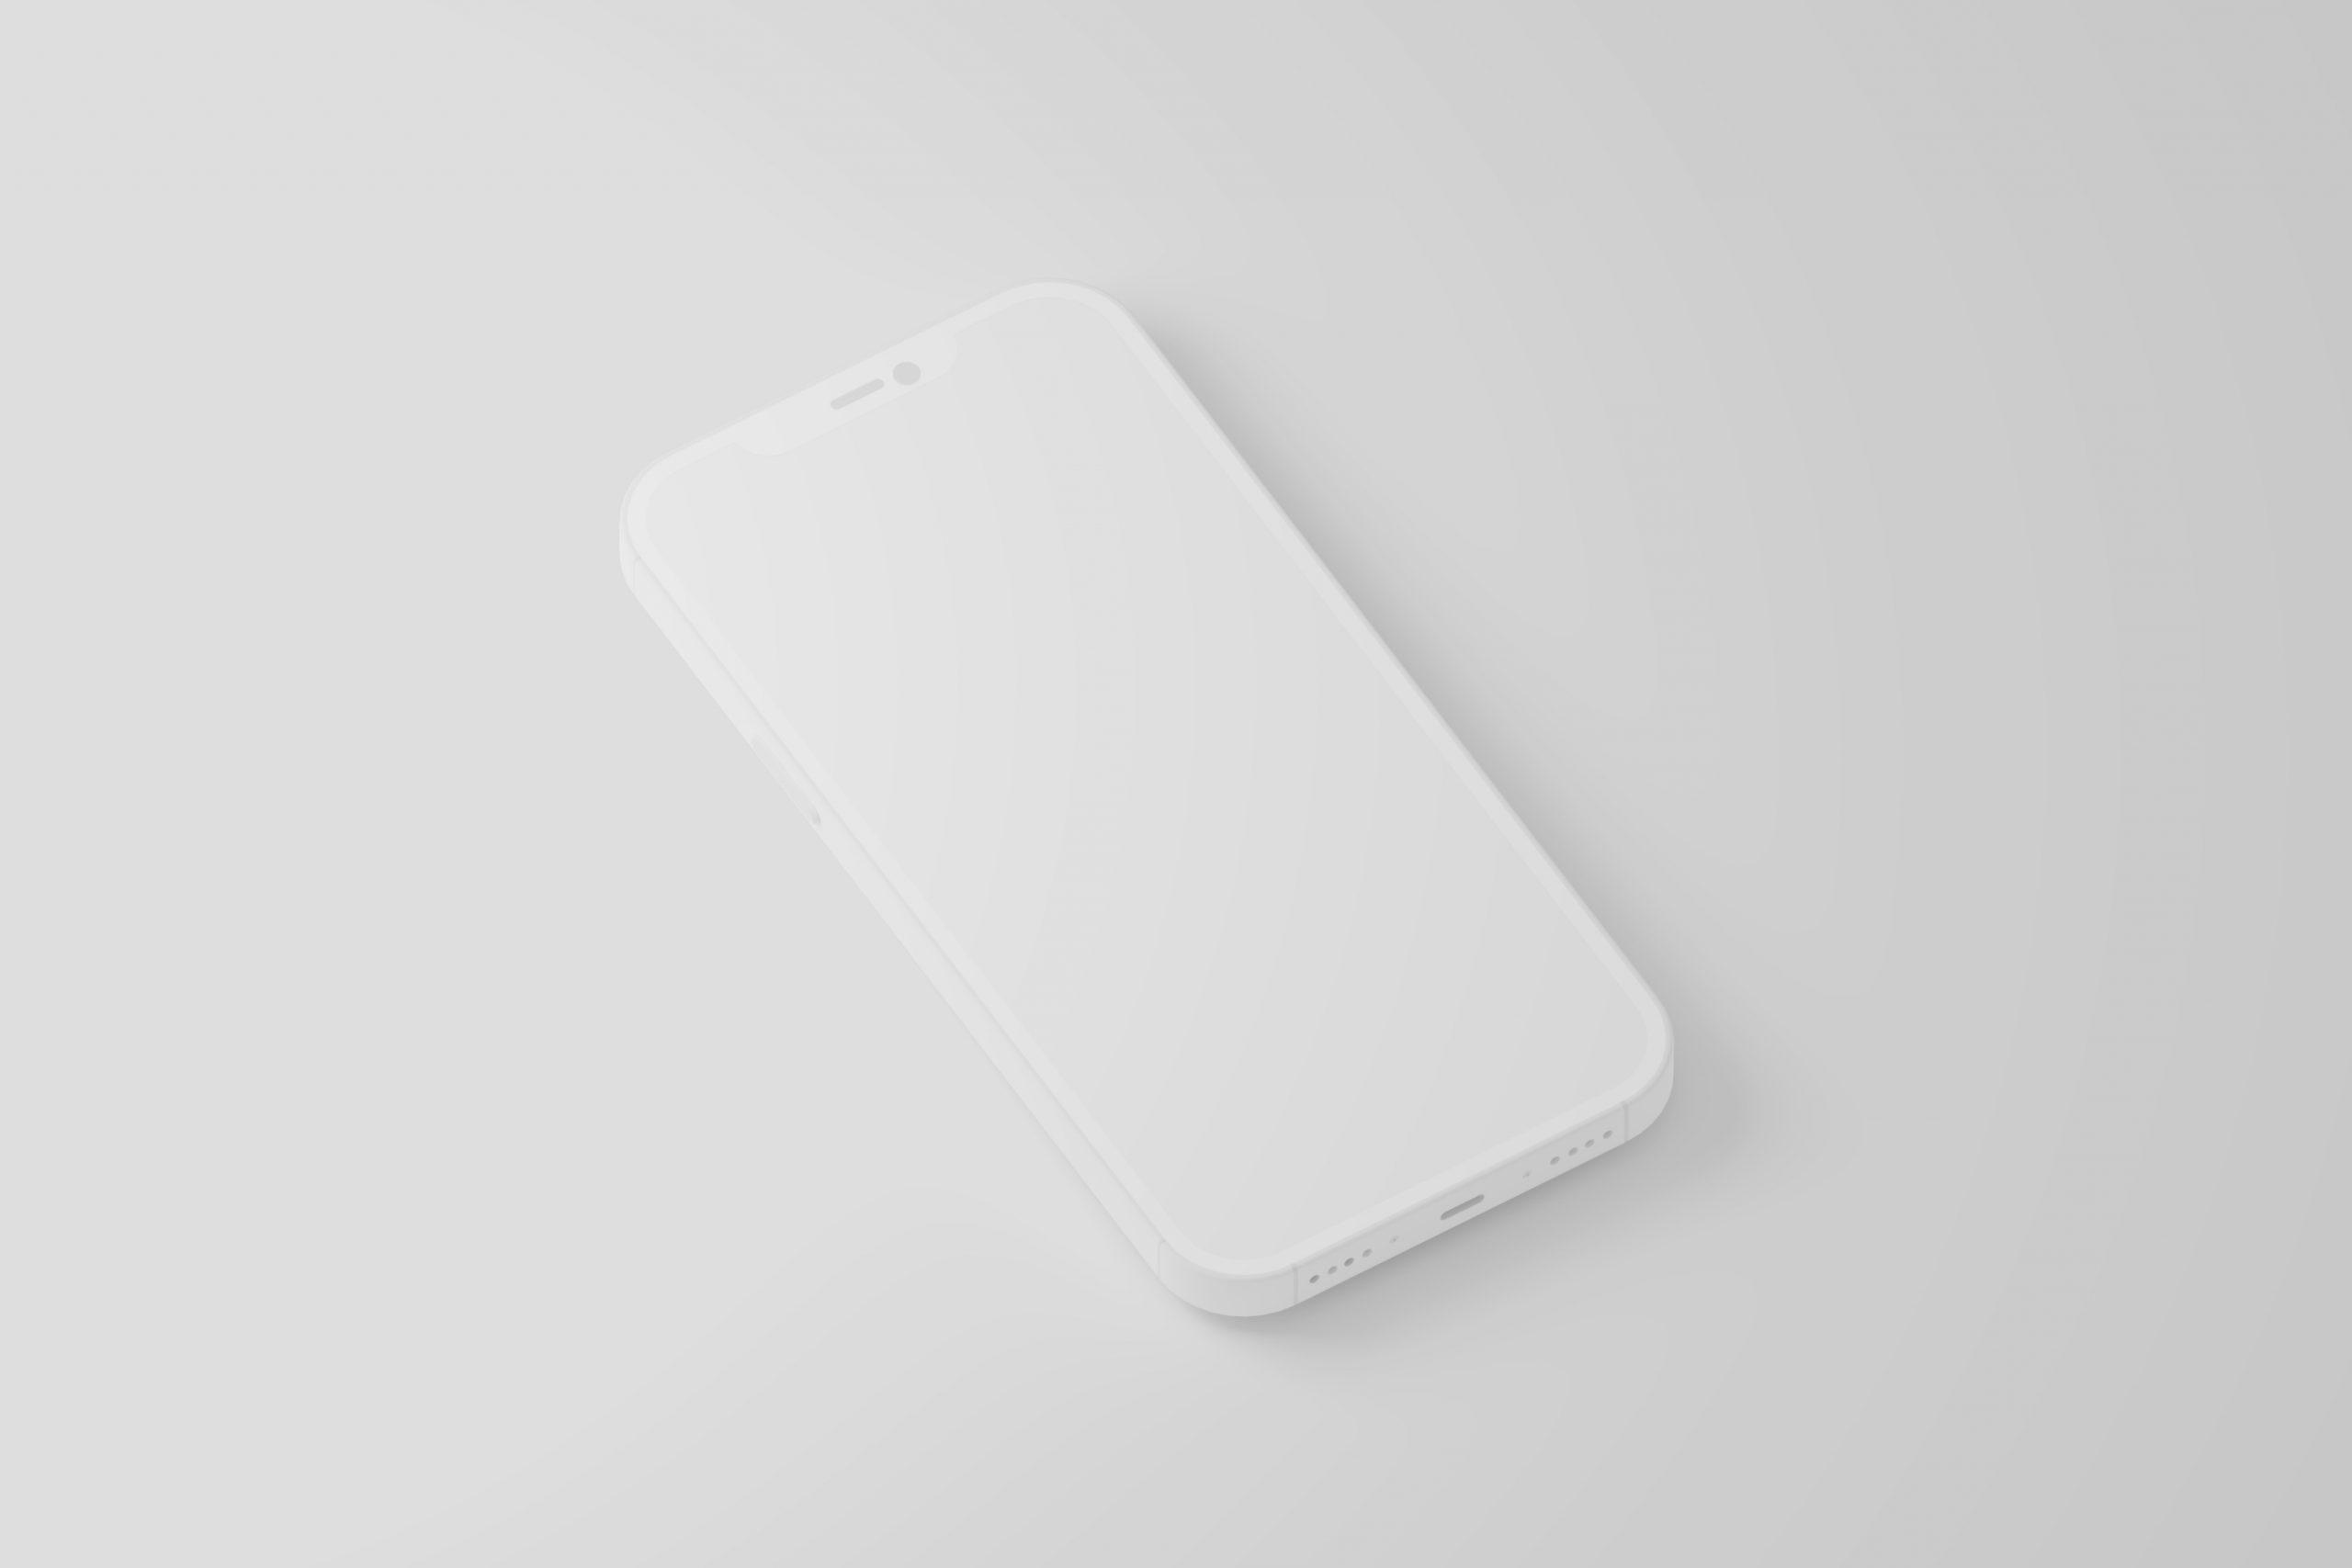 Free iPhone 12 Minimal Clay Mockup